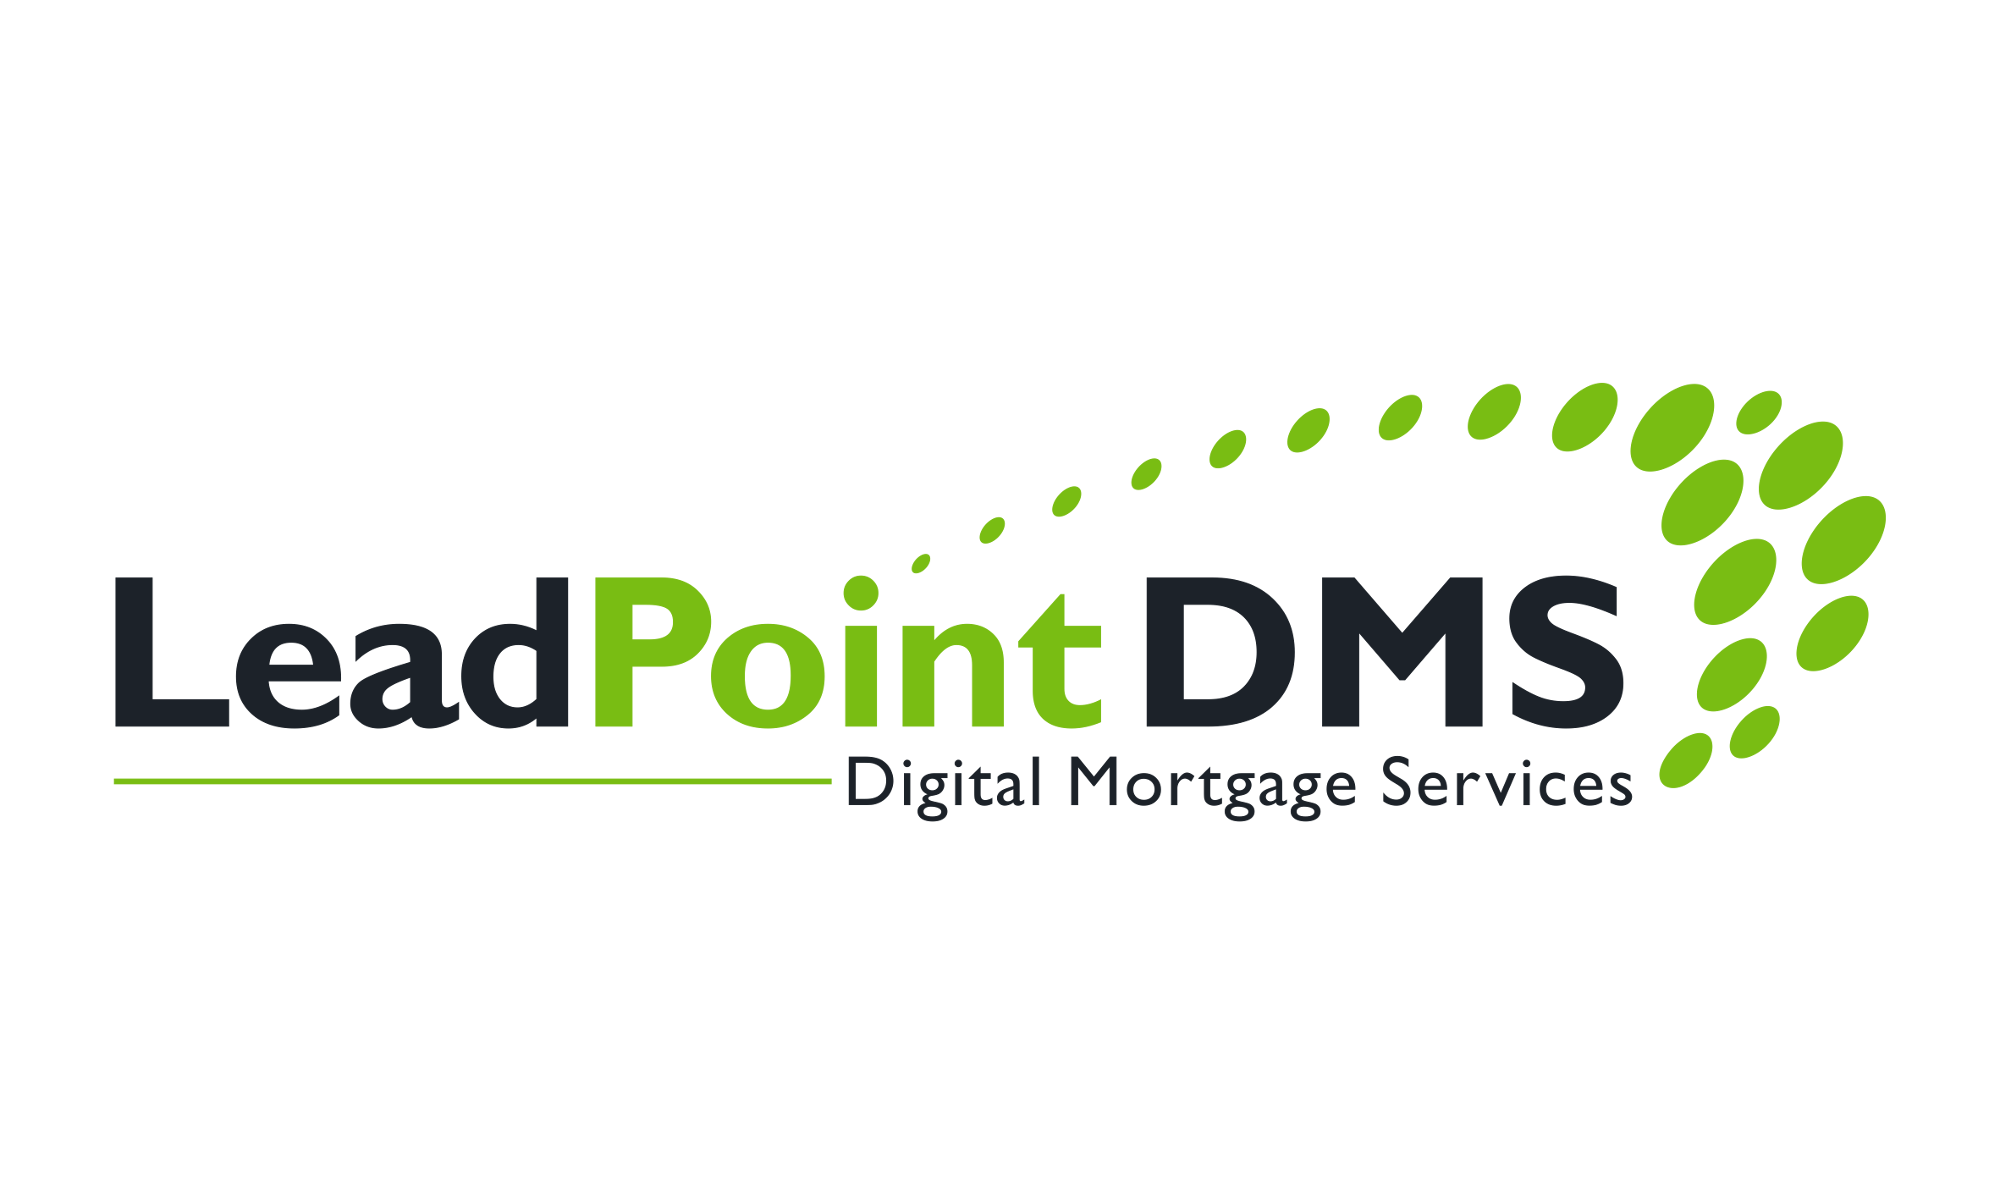 LeadPoint DMS